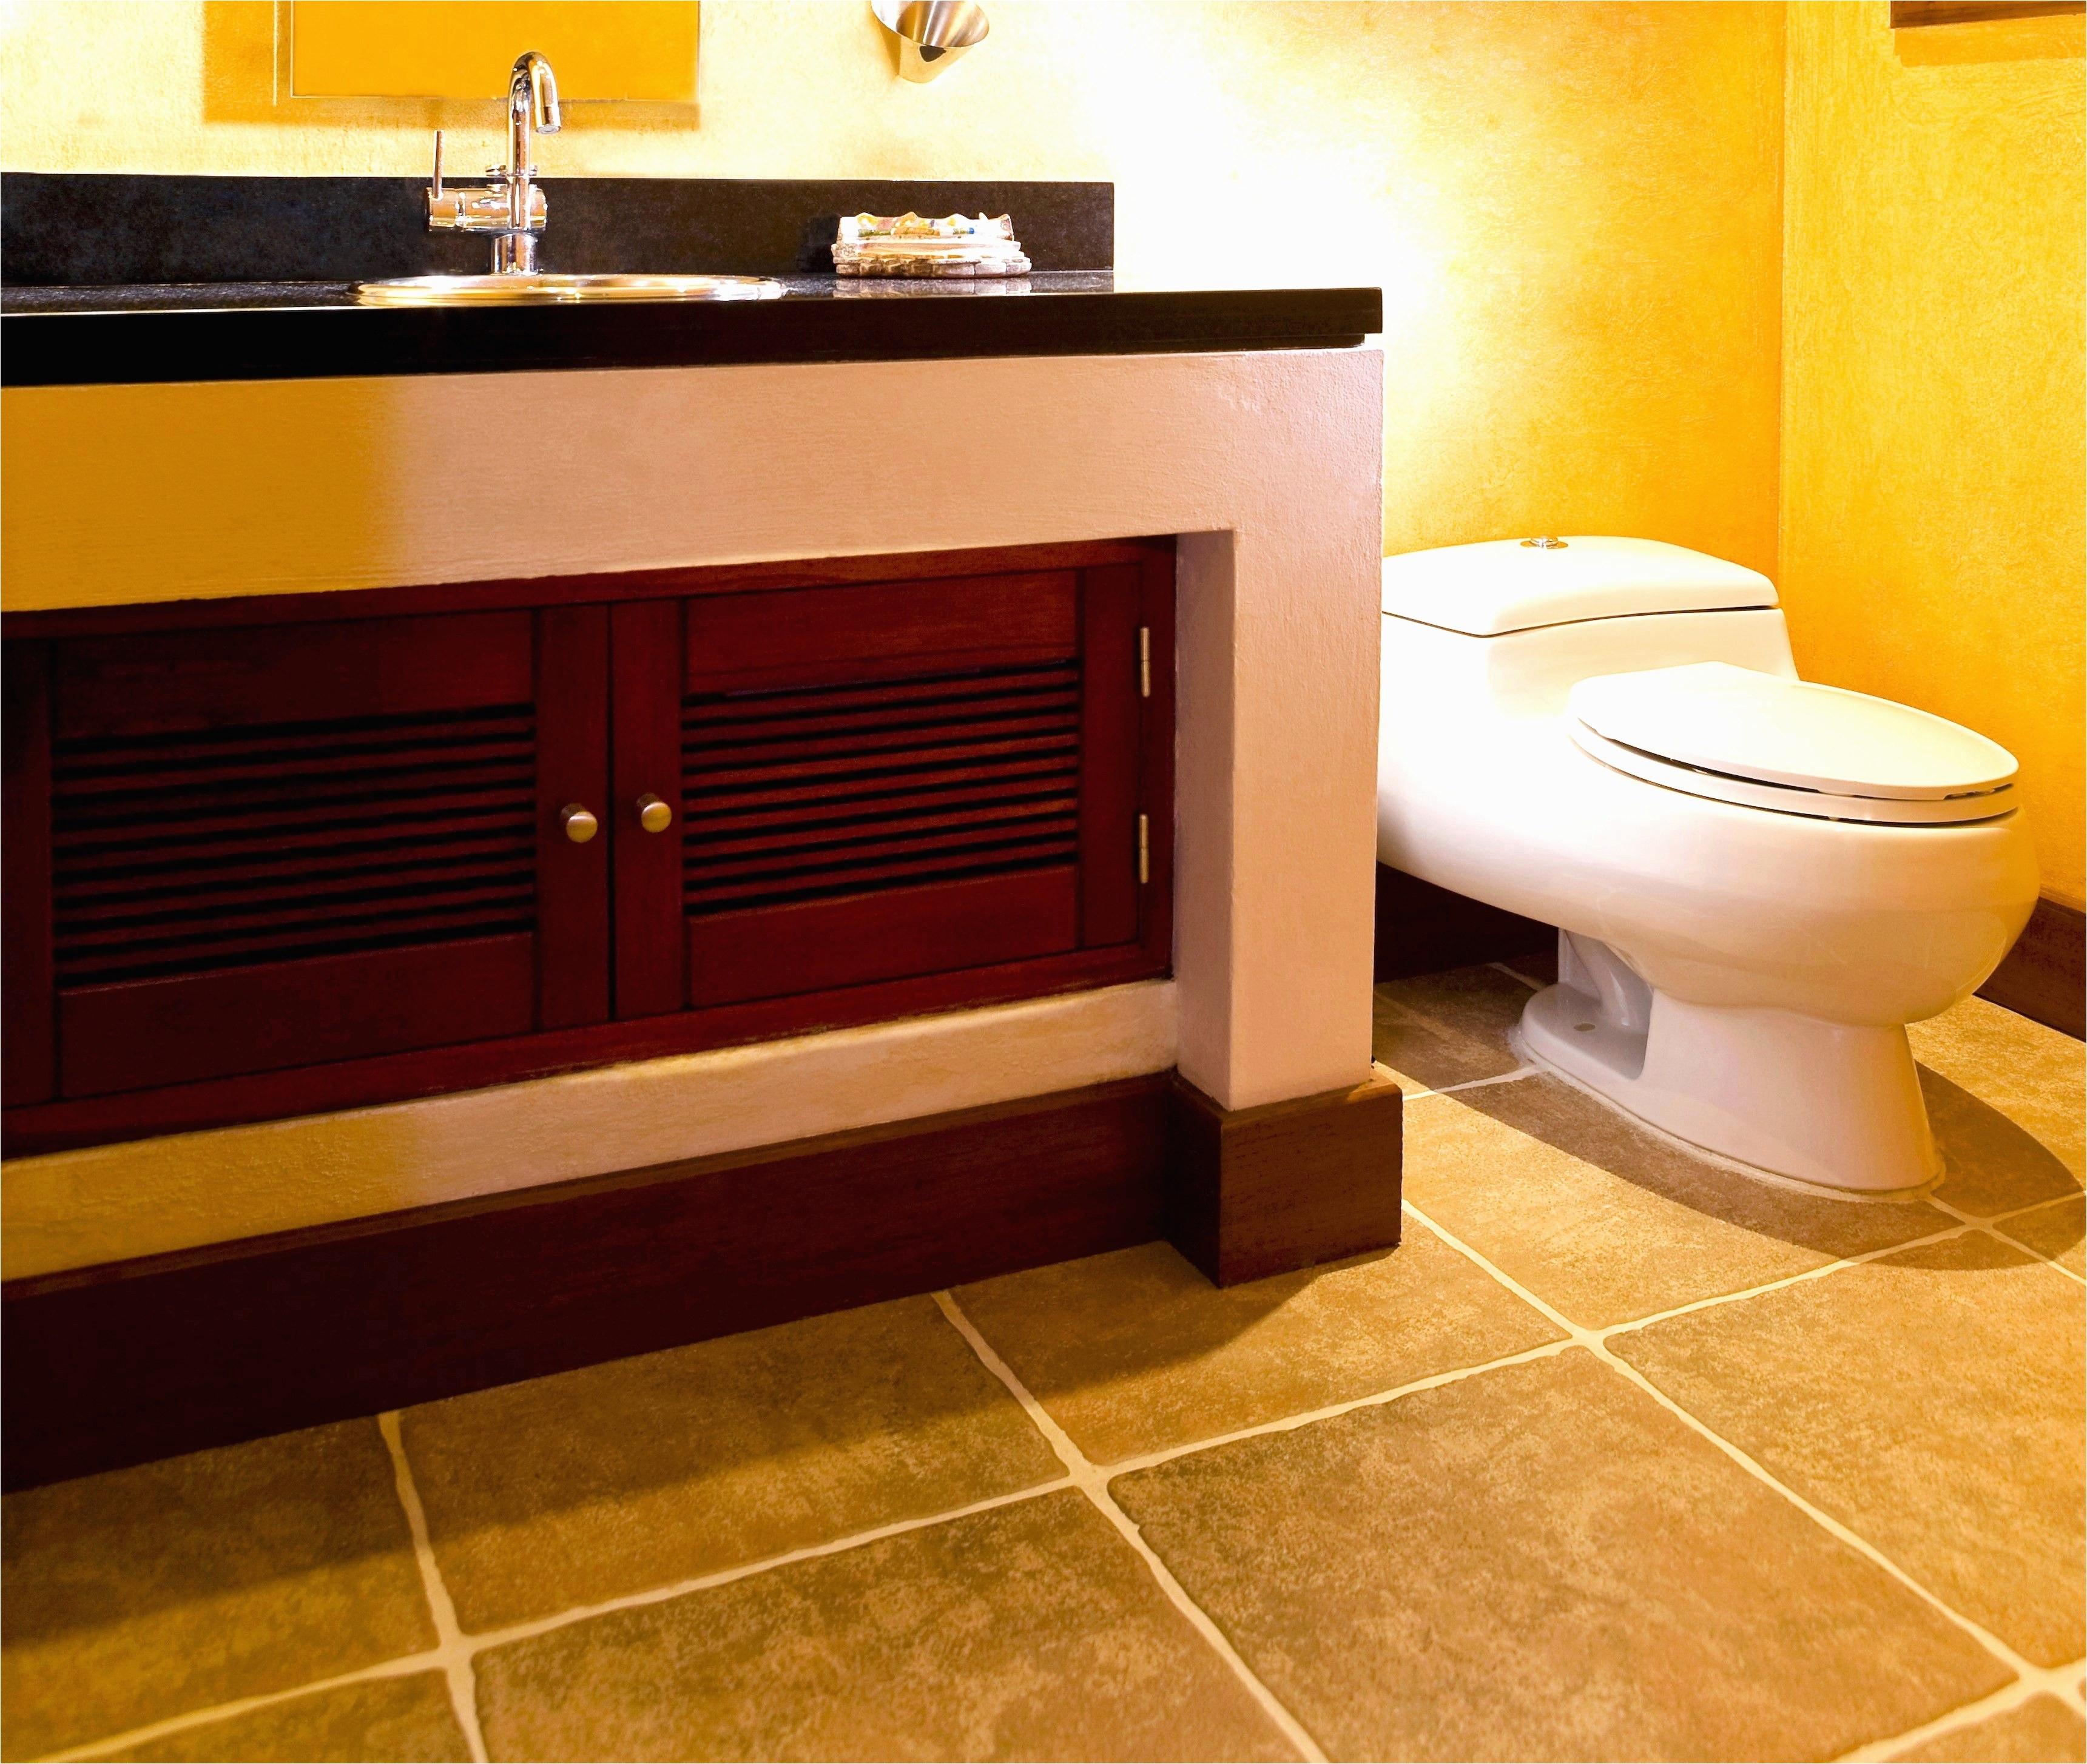 Porcelain Floor Tiles Porcelain Tiles for Bathroom Awesome Floor Tiles Mosaic Bathroom 0d